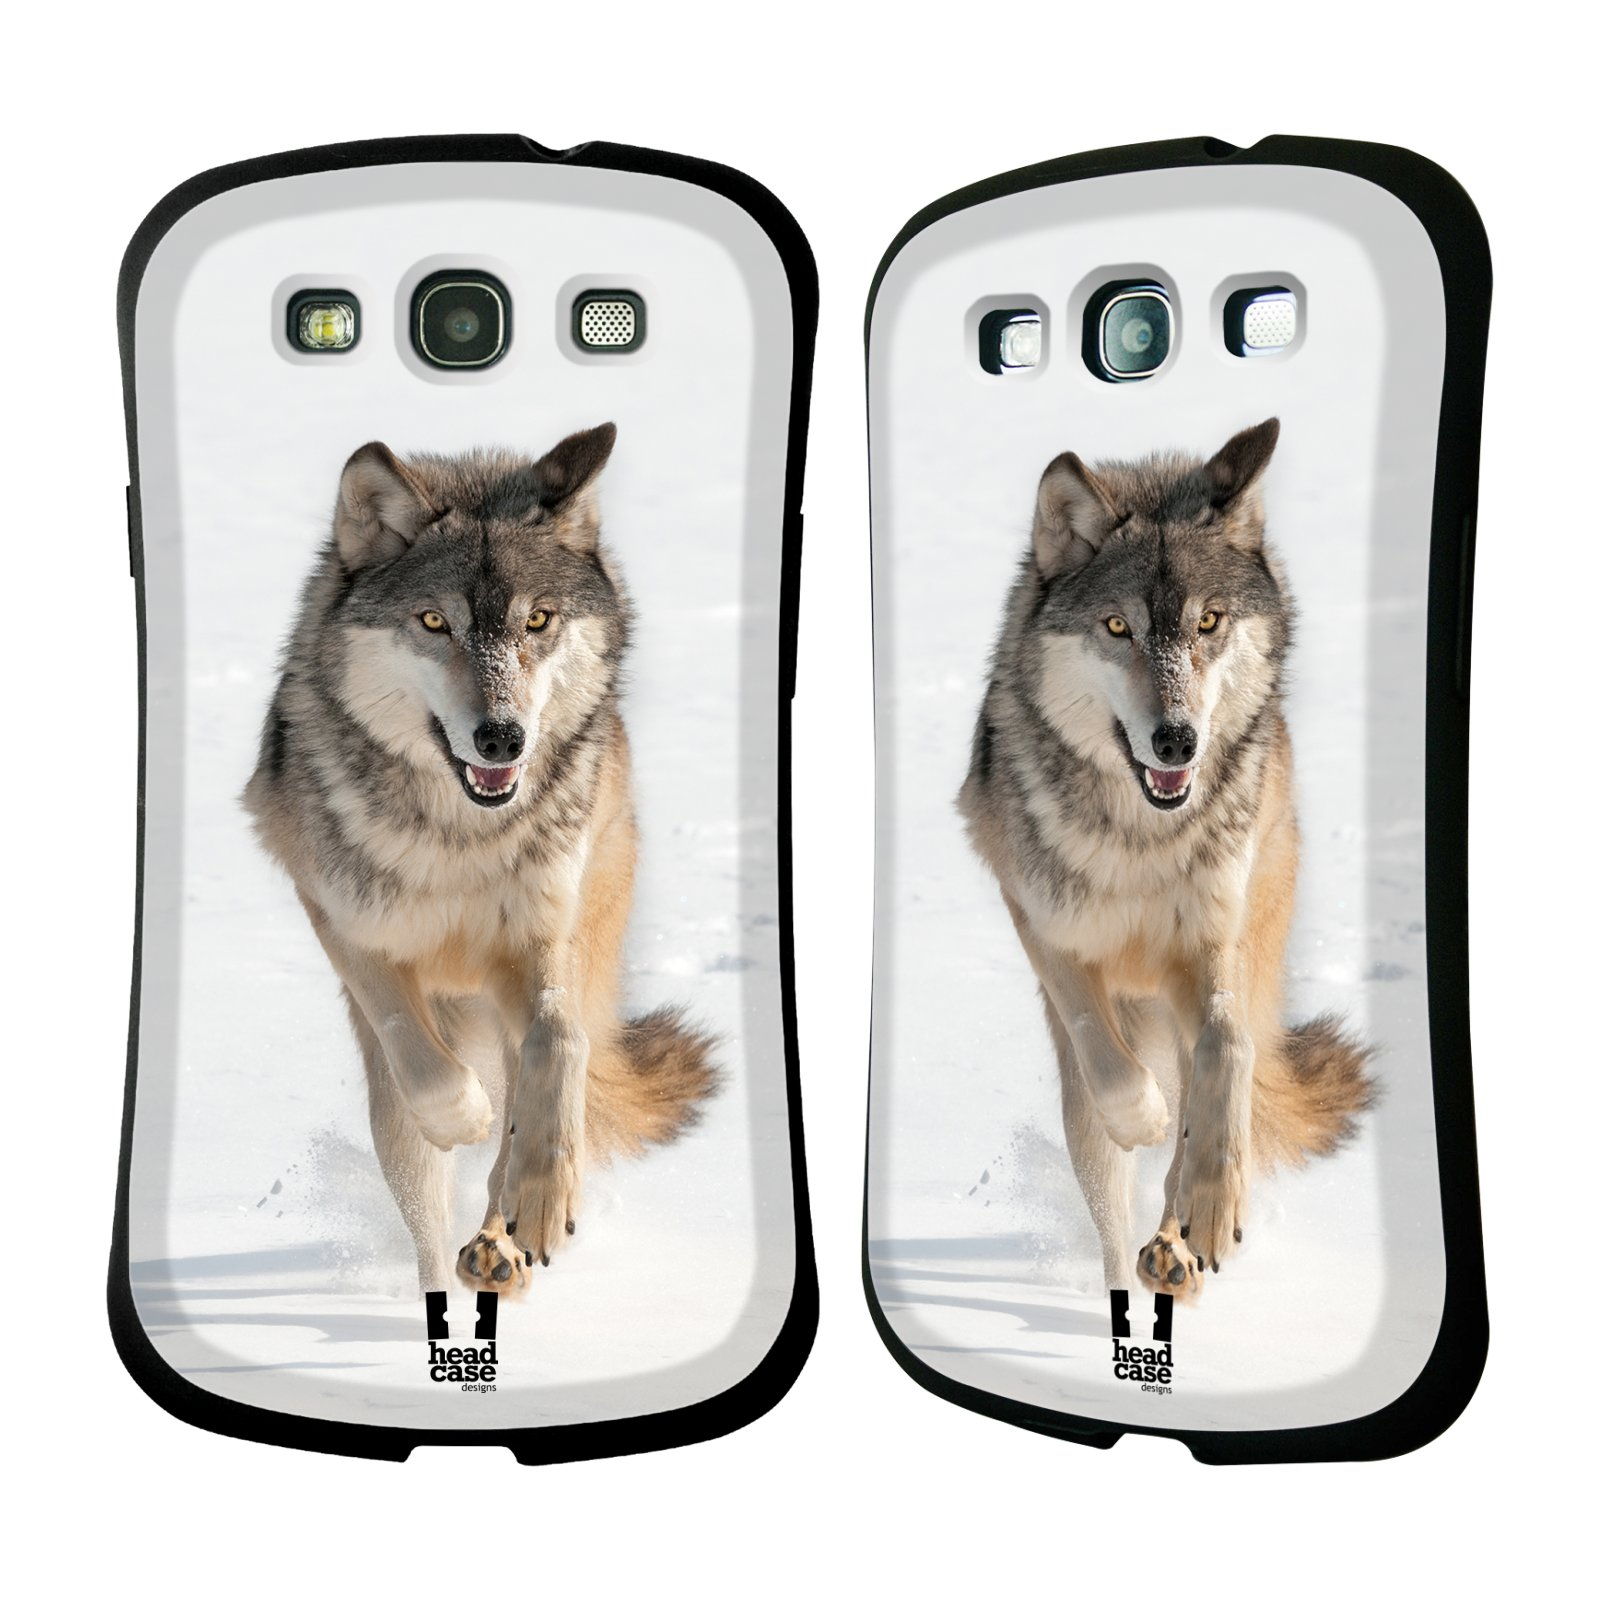 HEAD CASE silikon/plast odolný obal na mobil Samsung Galaxy S3 vzor Divočina, Divoký život a zvířata foto BĚŽÍCÍ VLK